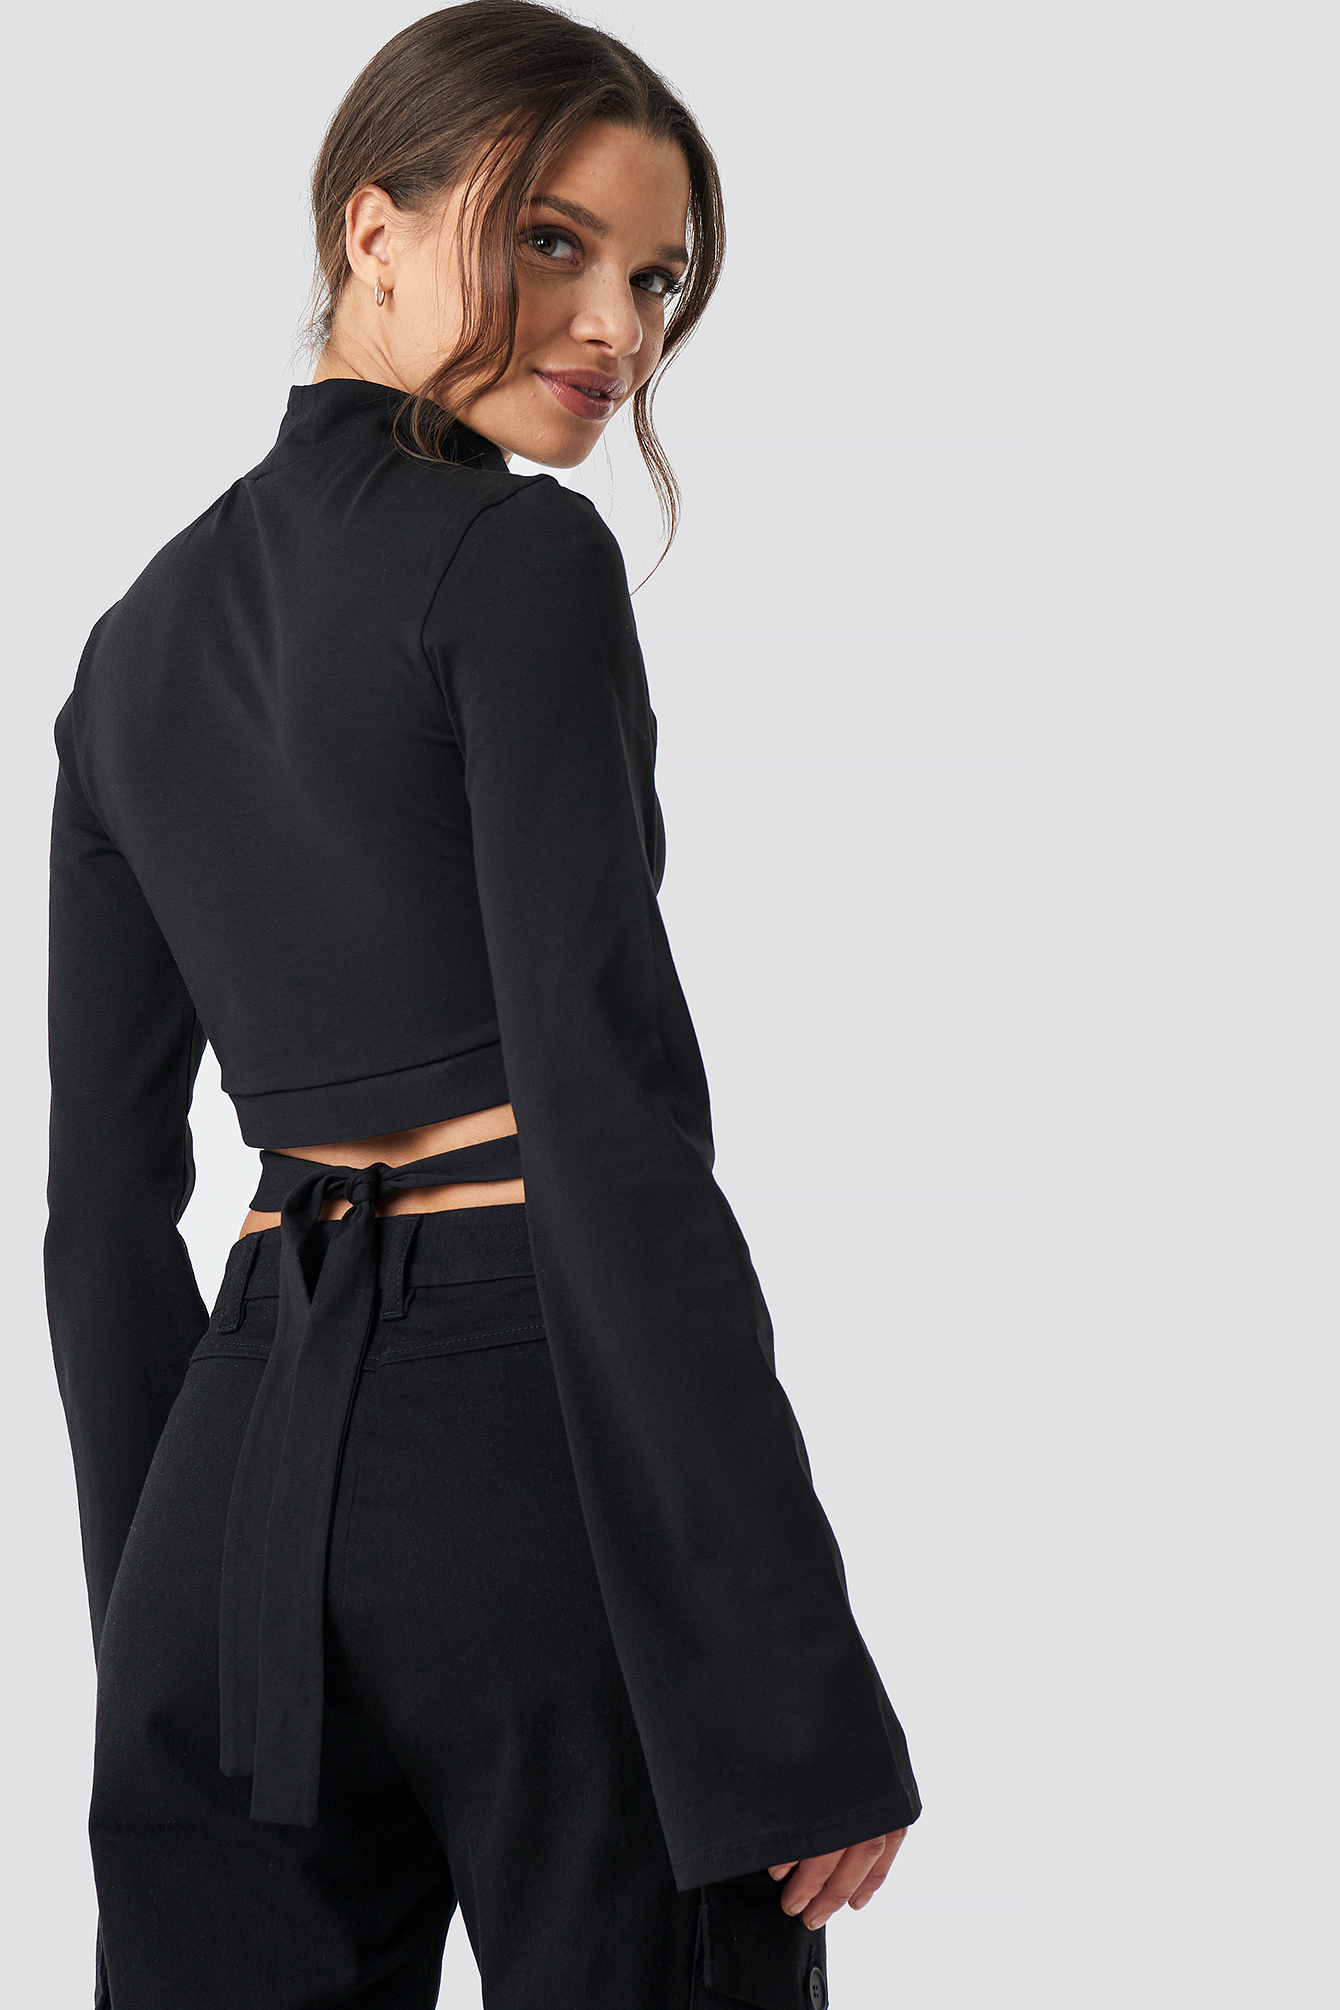 Waist Strap Long Sleeve Crop NA-KD.COM